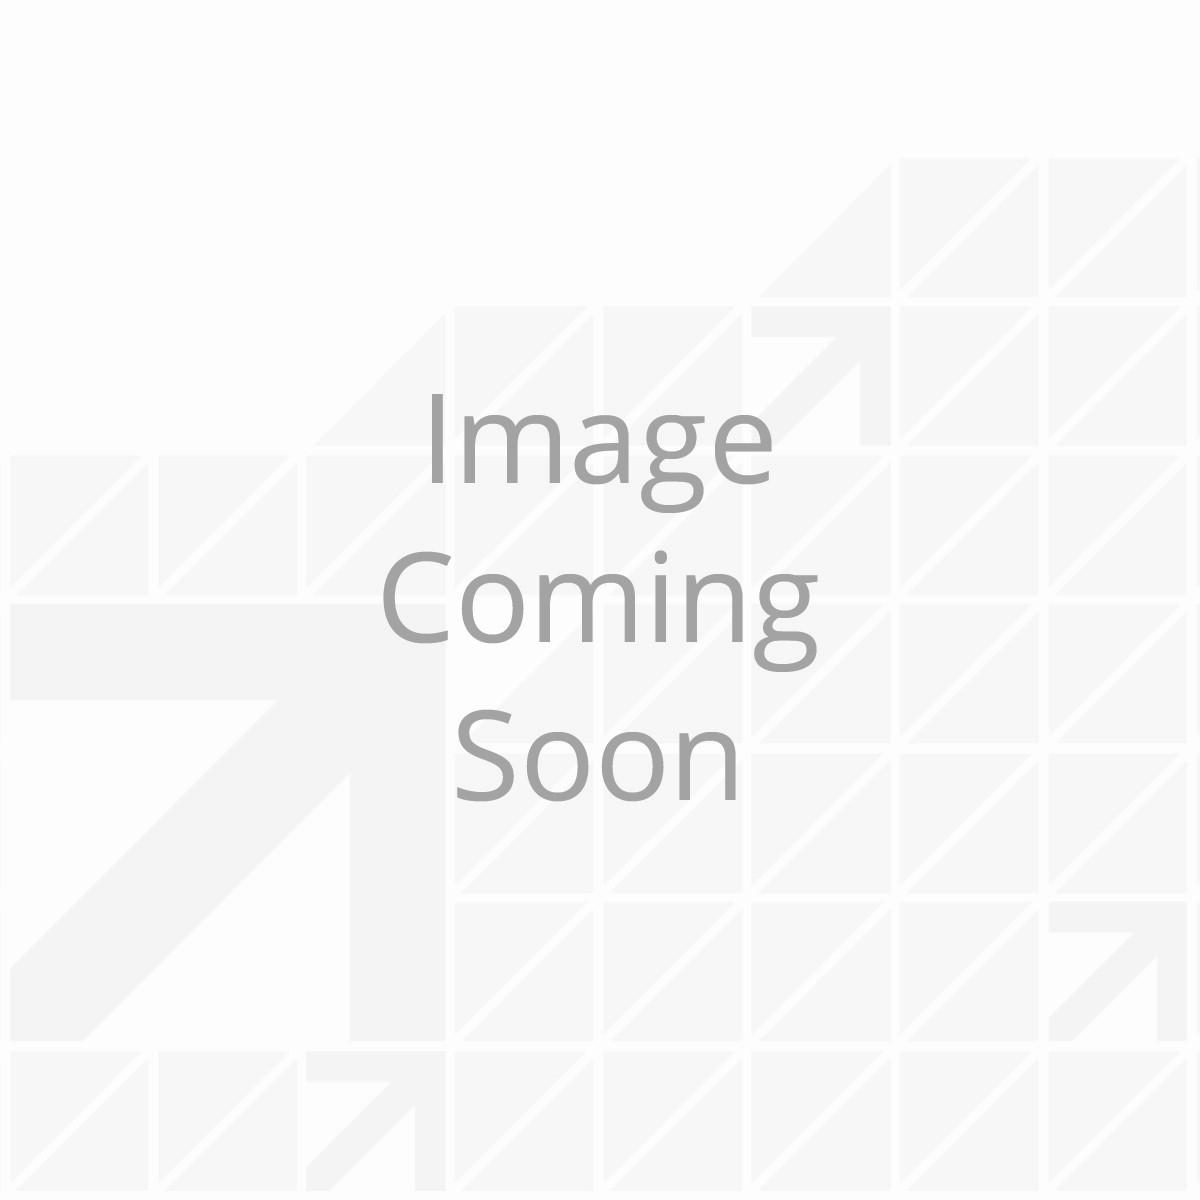 JT's Strong Arm Jack Stabilizer - Travel Trailer Kit